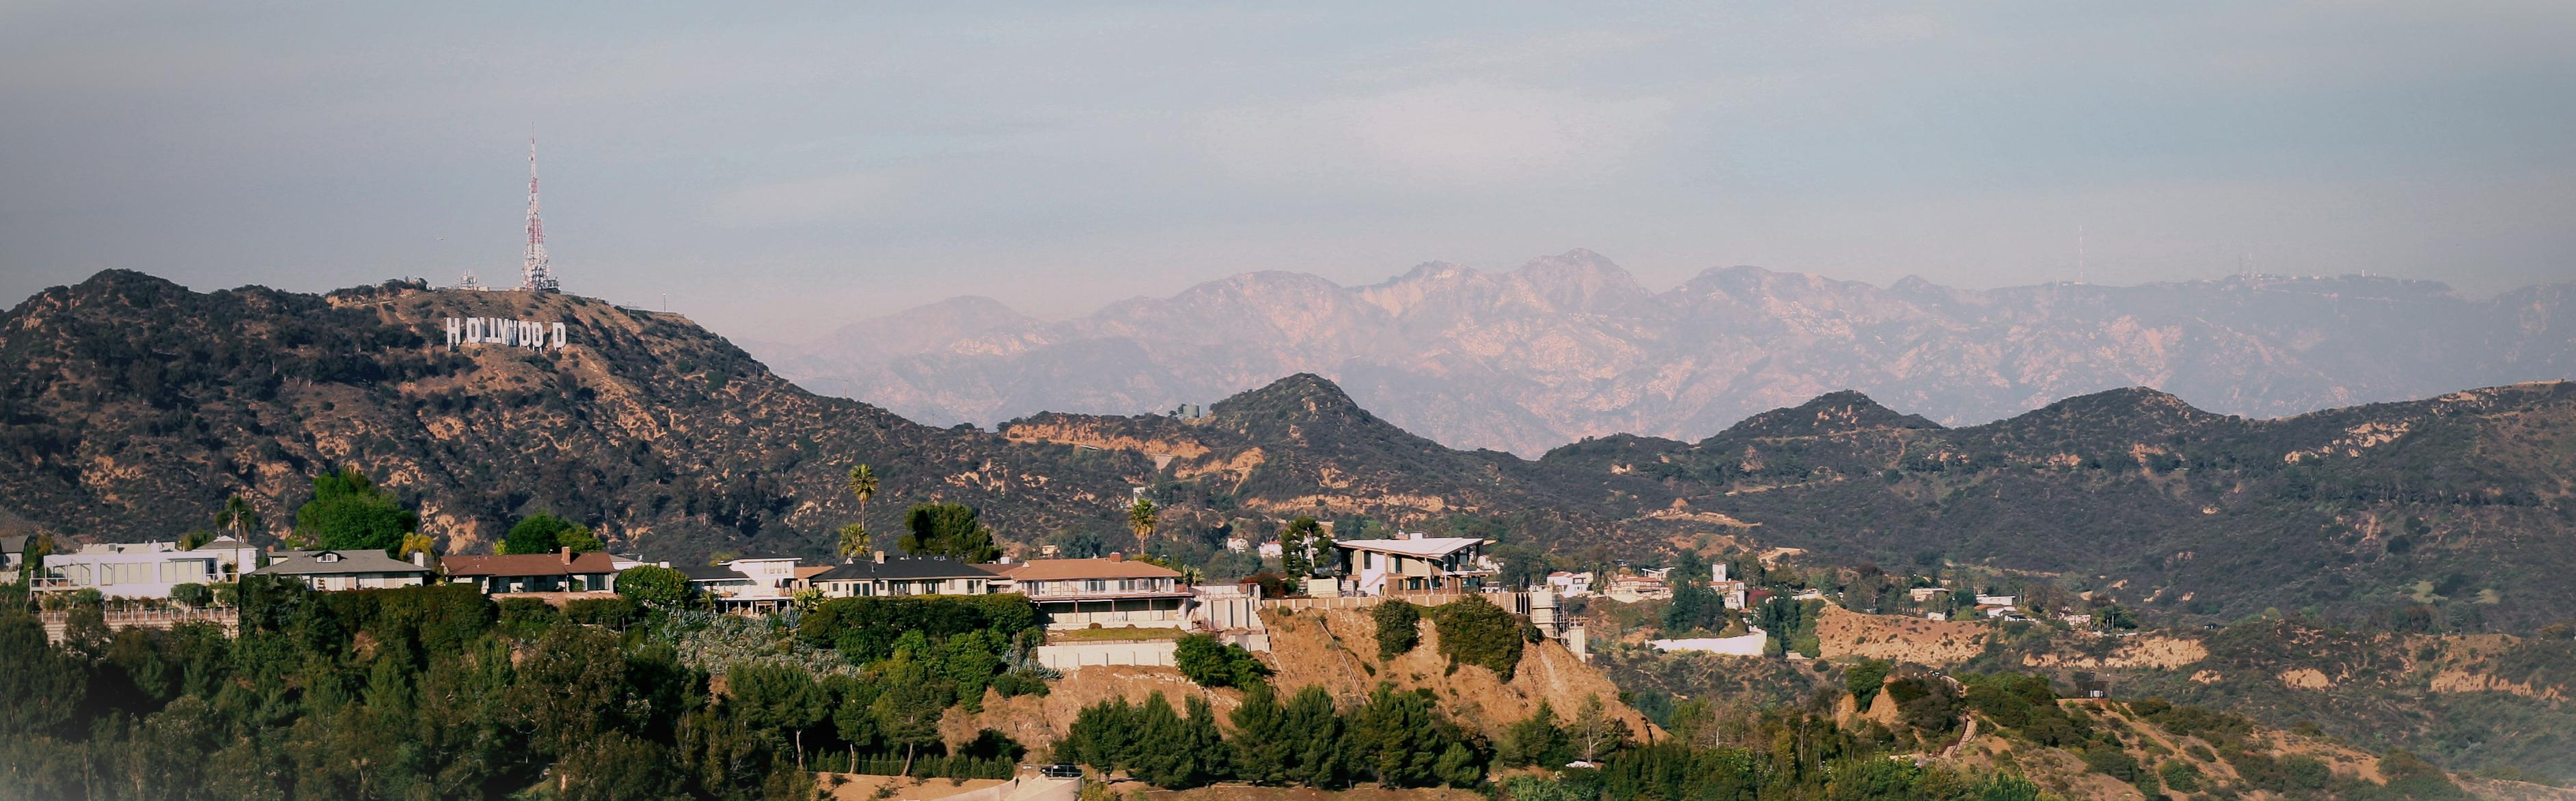 Hollywood POV photo